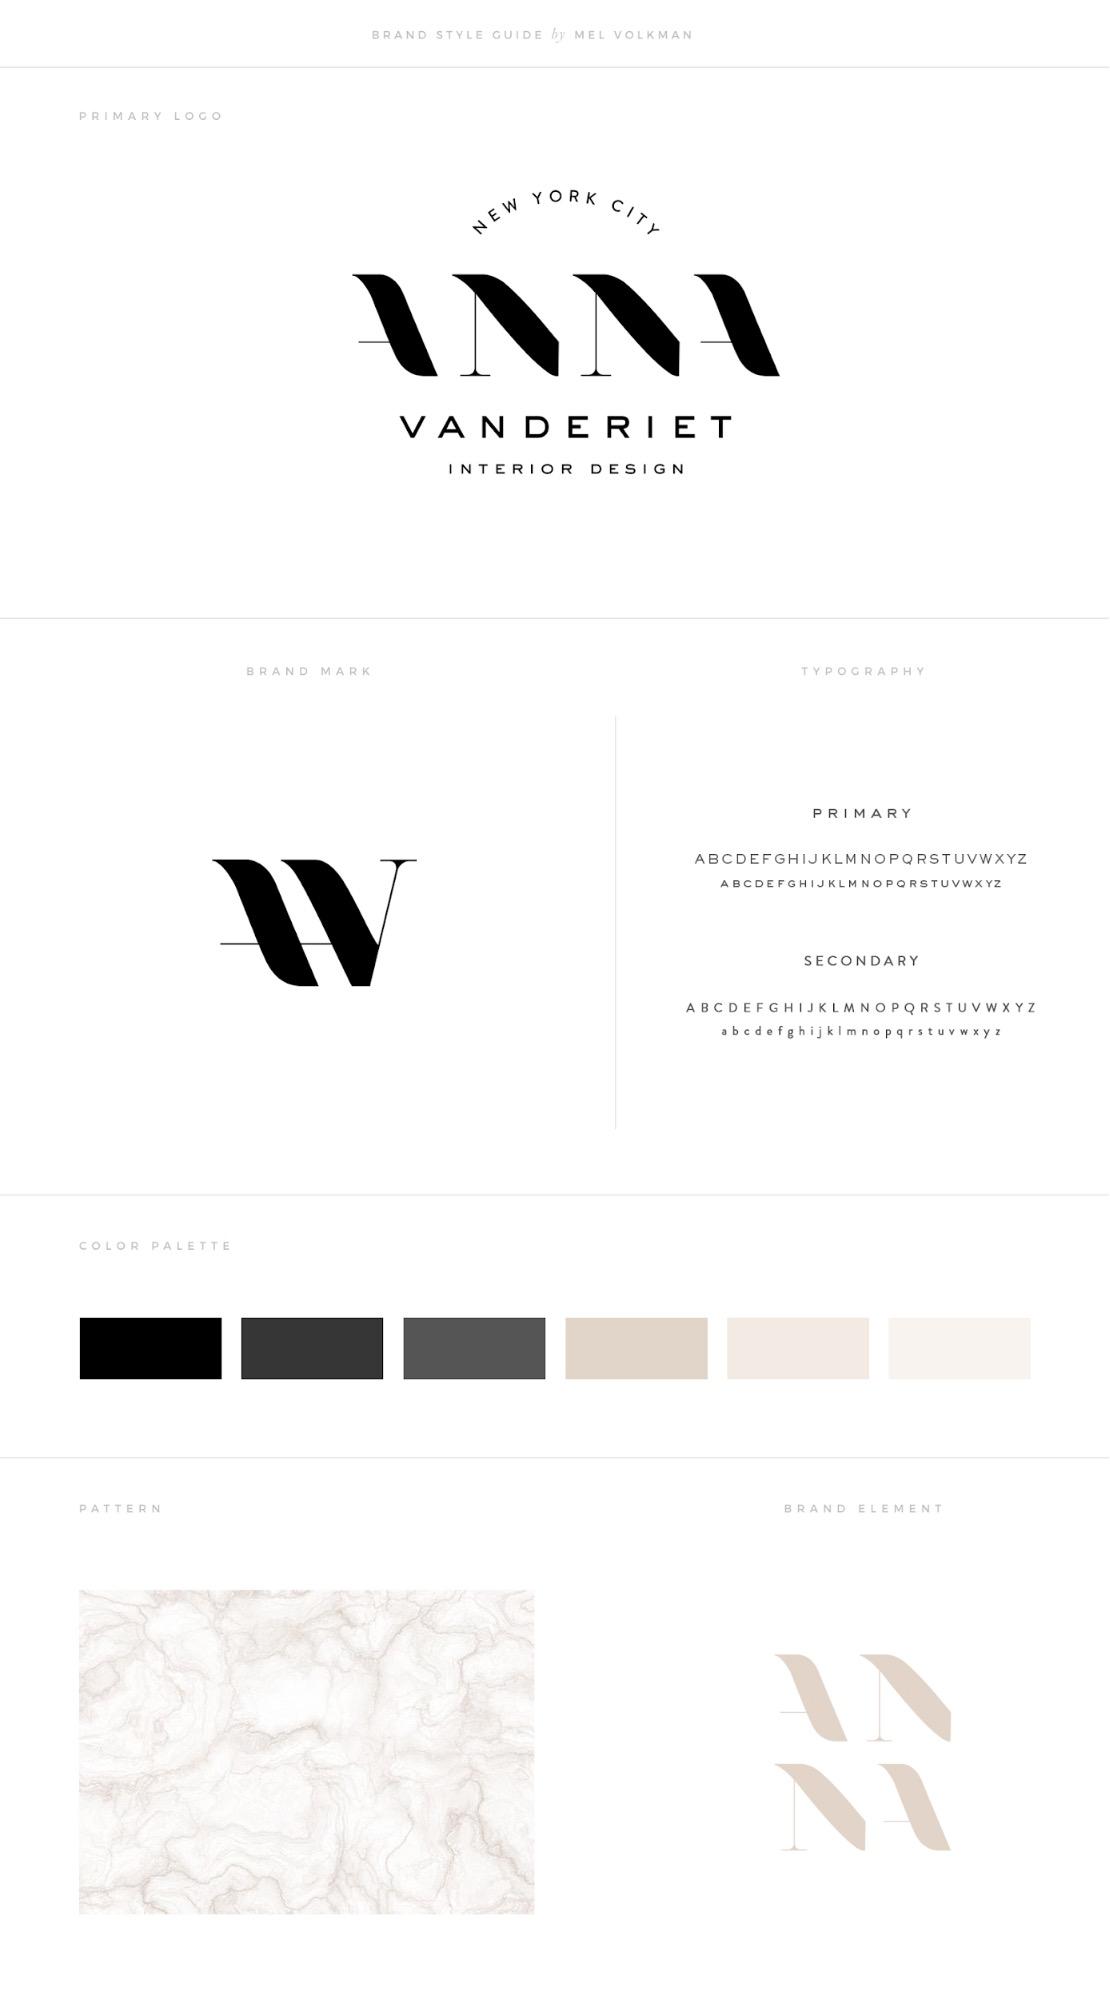 Minimalist Interior Design Brand Guide Example